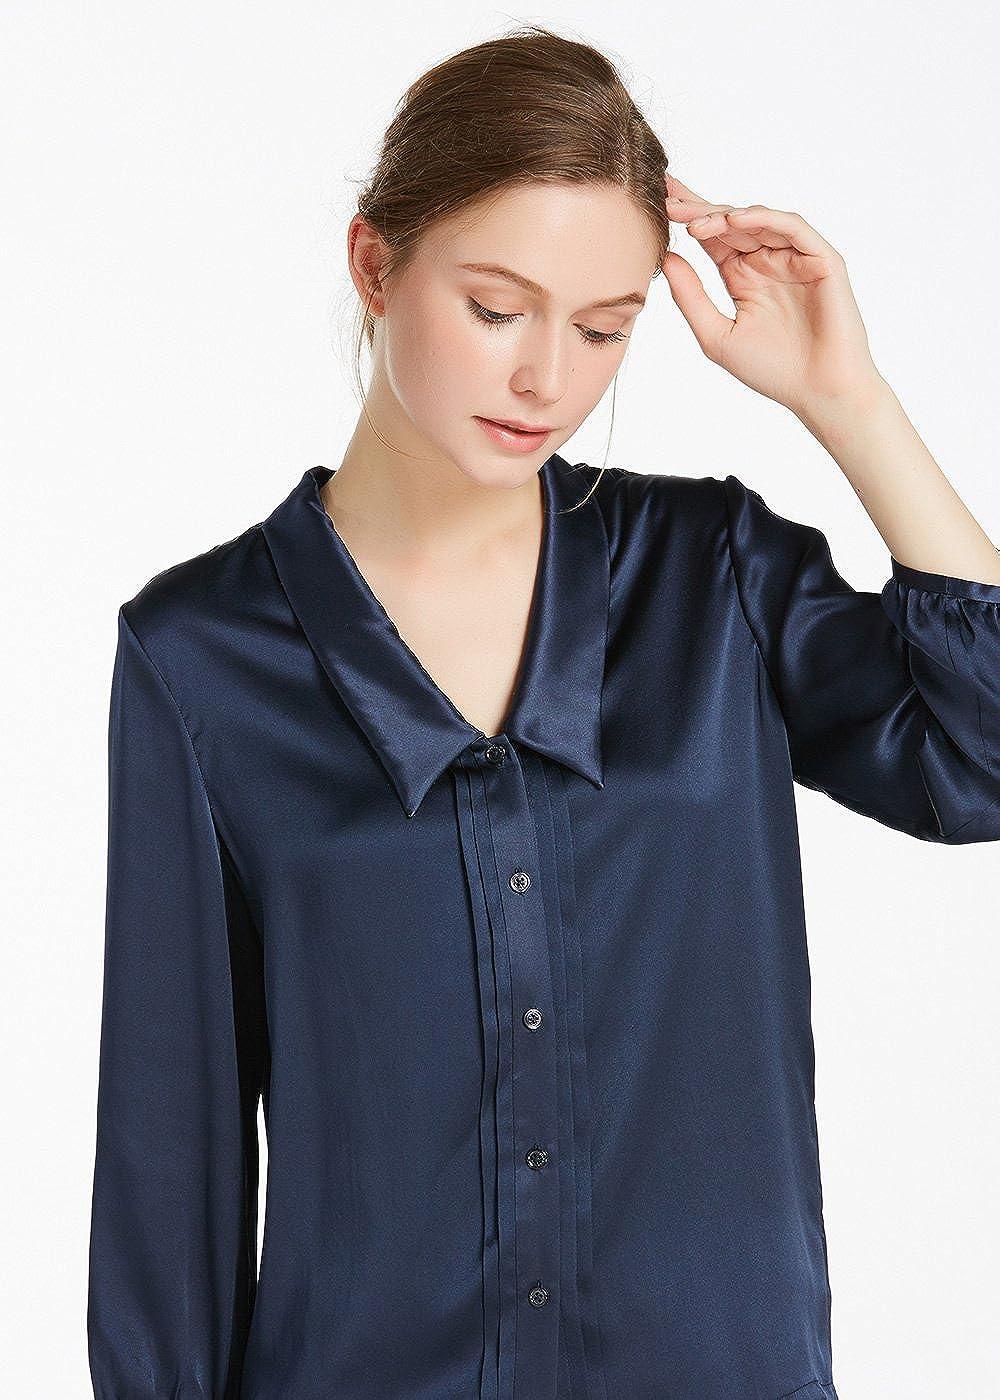 Lilysilk Women S Charmeuse Silk Blouse Deep V Neck Top 22 Momme Soft